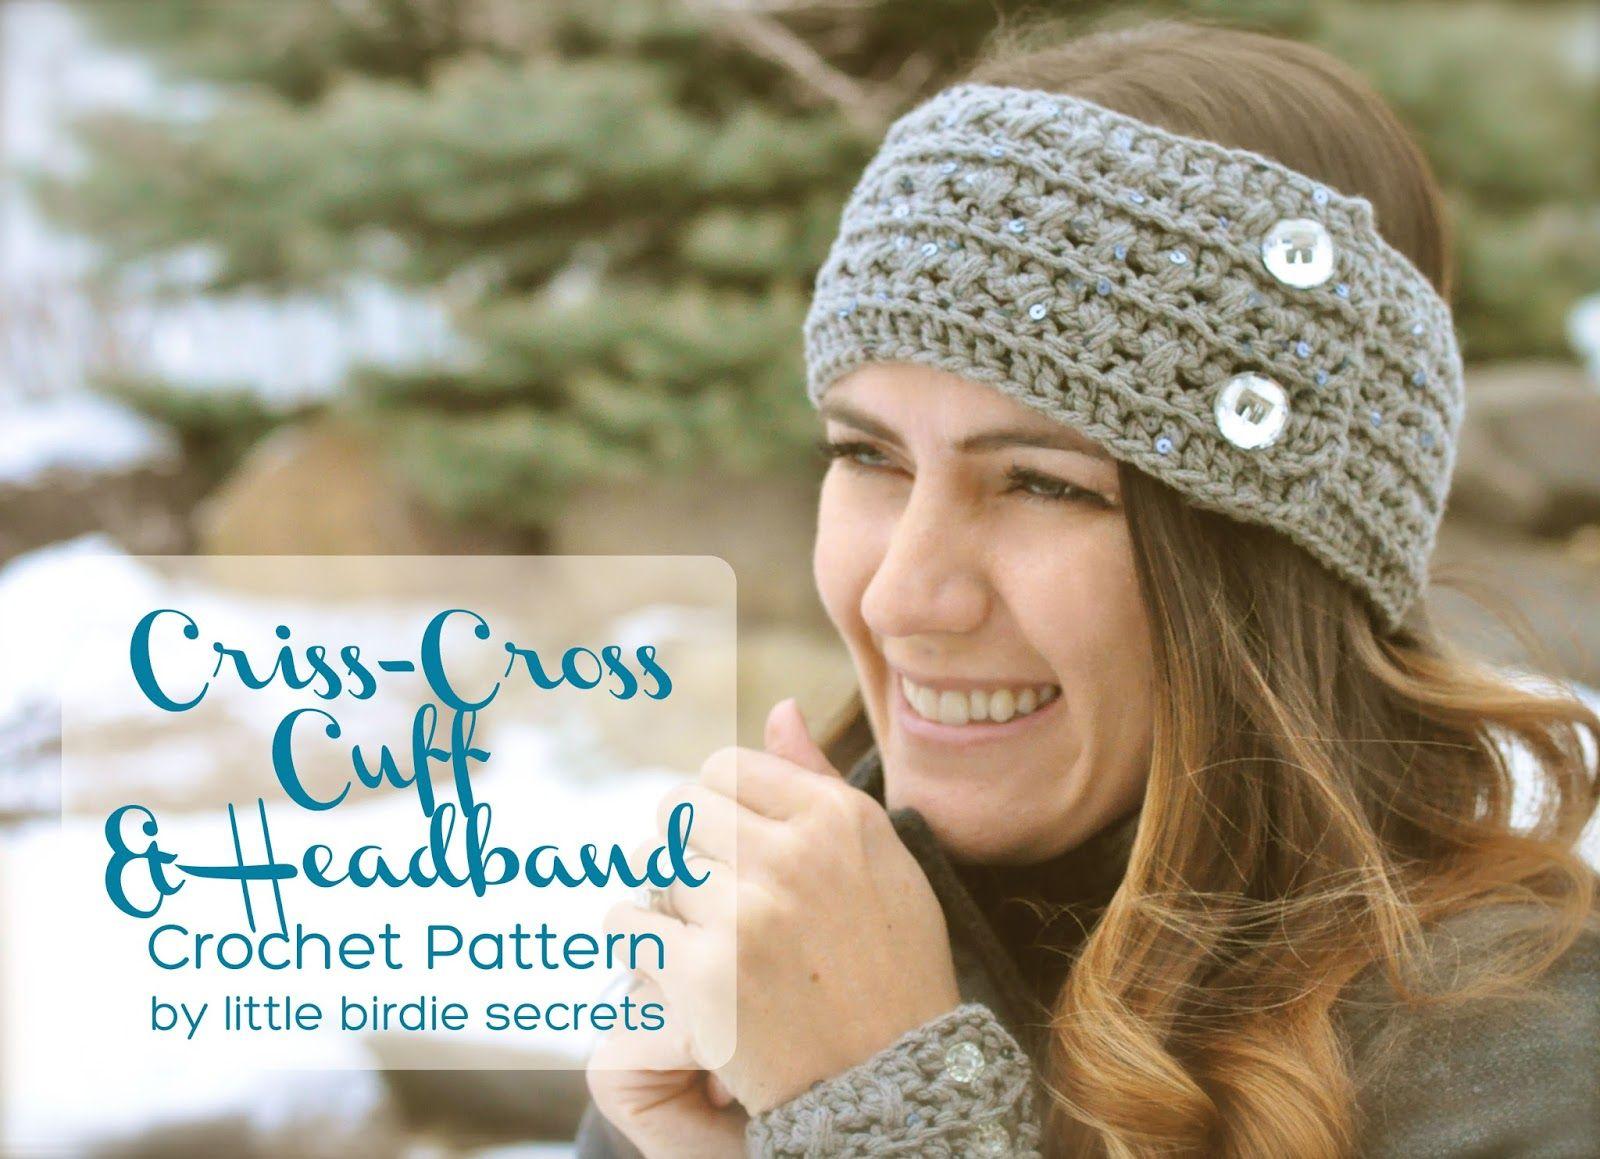 Free crochet headband and cuff pattern crocheted headbands ear warmers free crochet headband and cuff pattern bankloansurffo Gallery